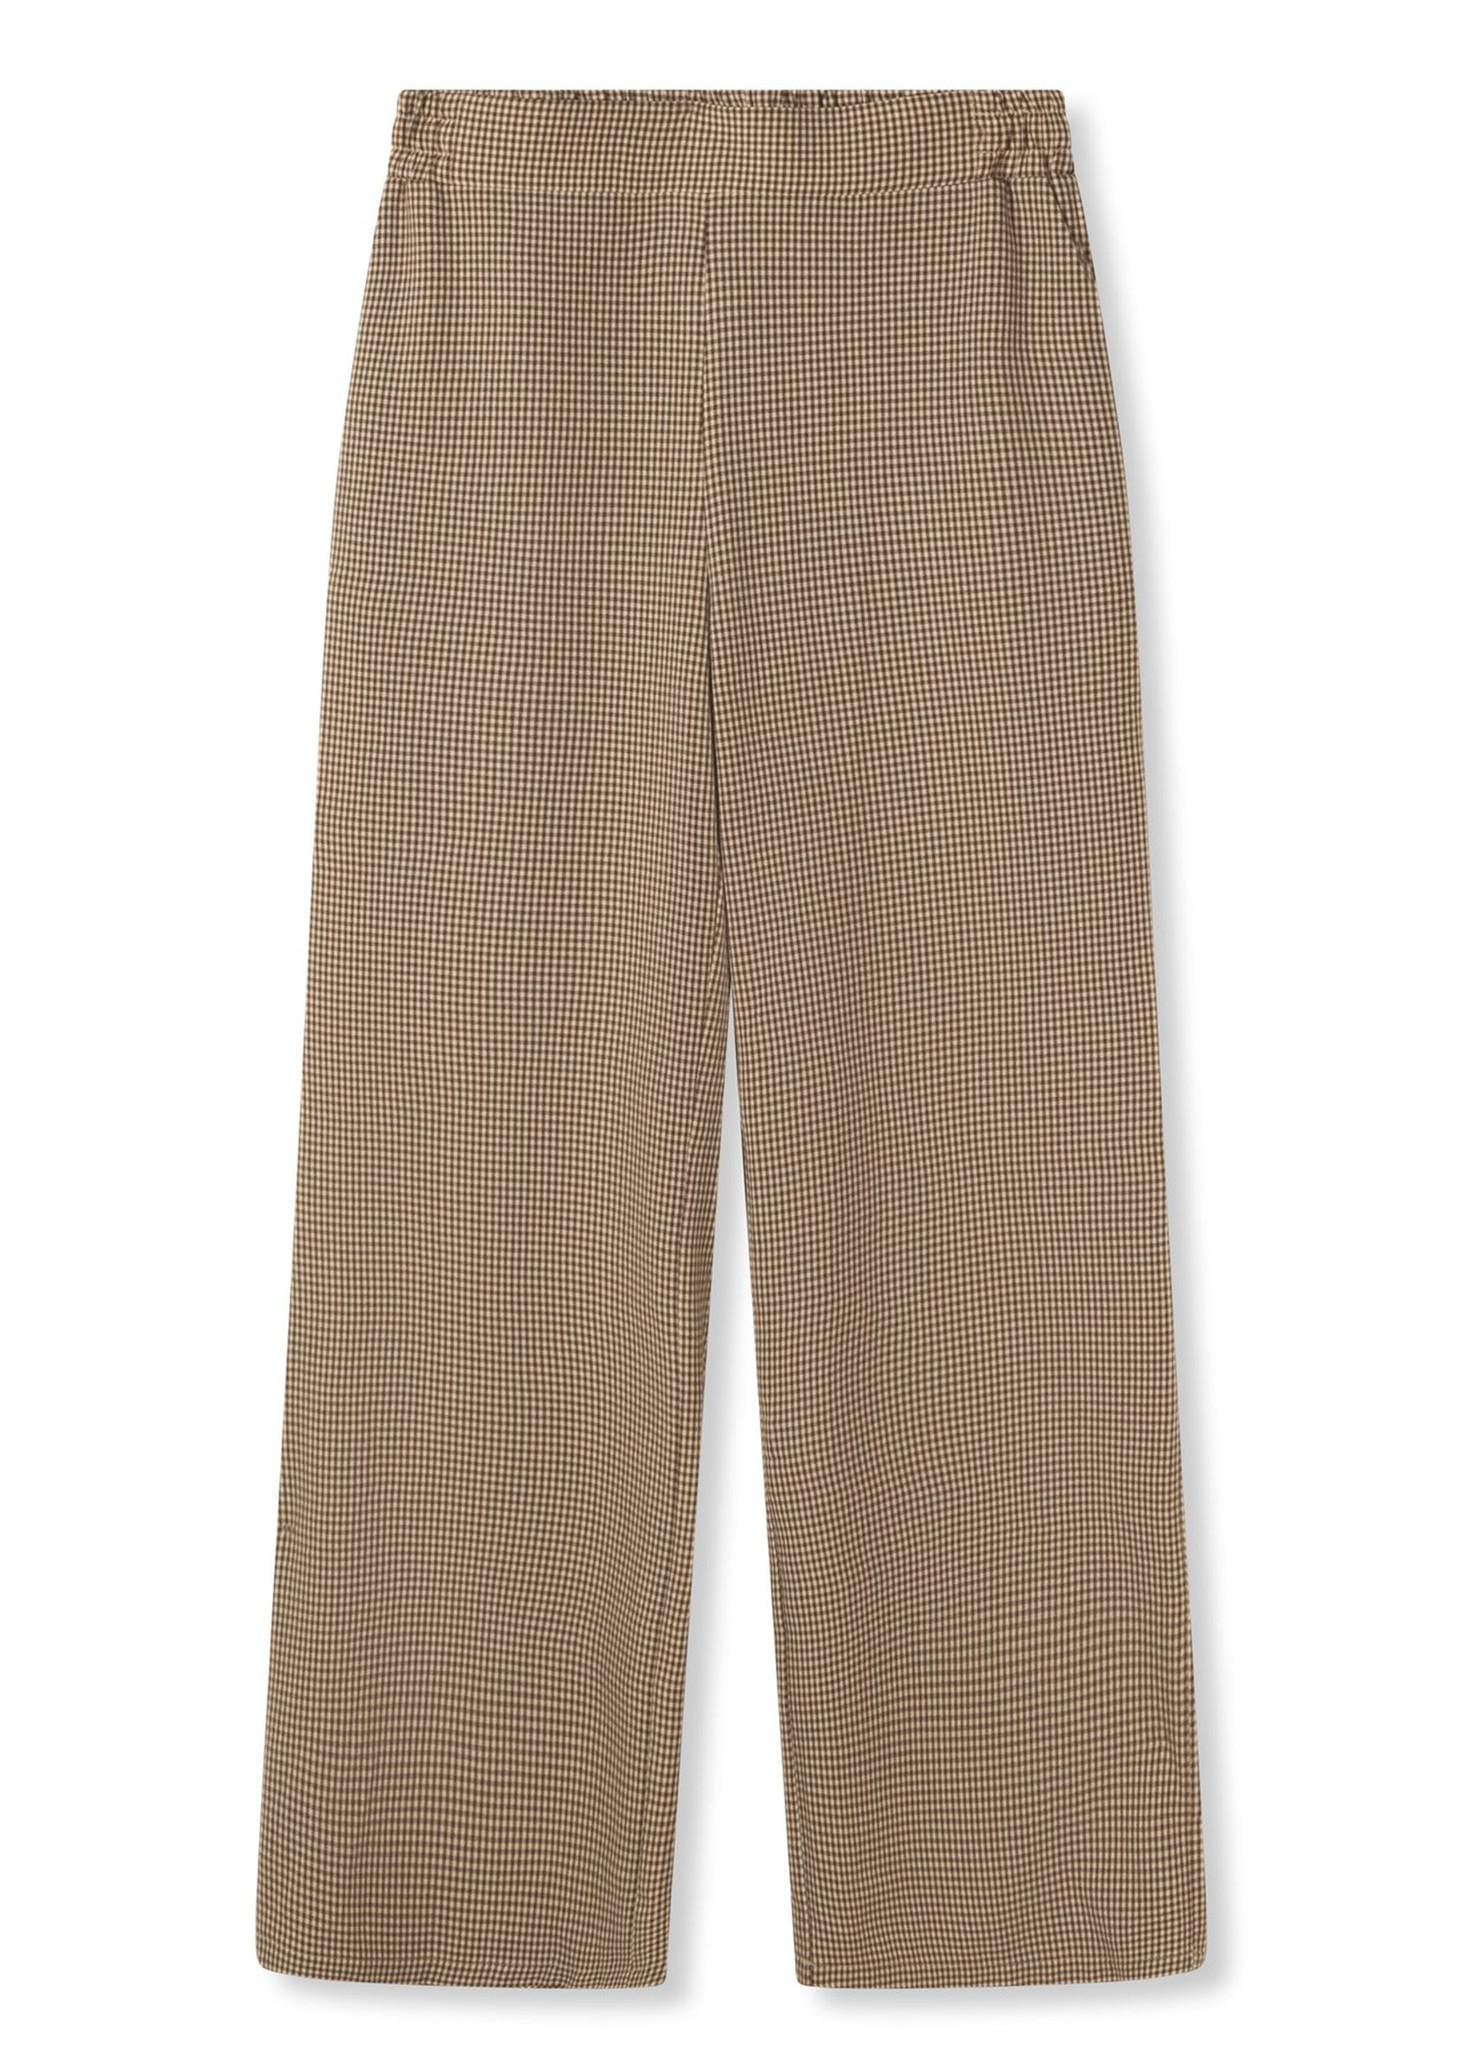 Woven Check Pants-3